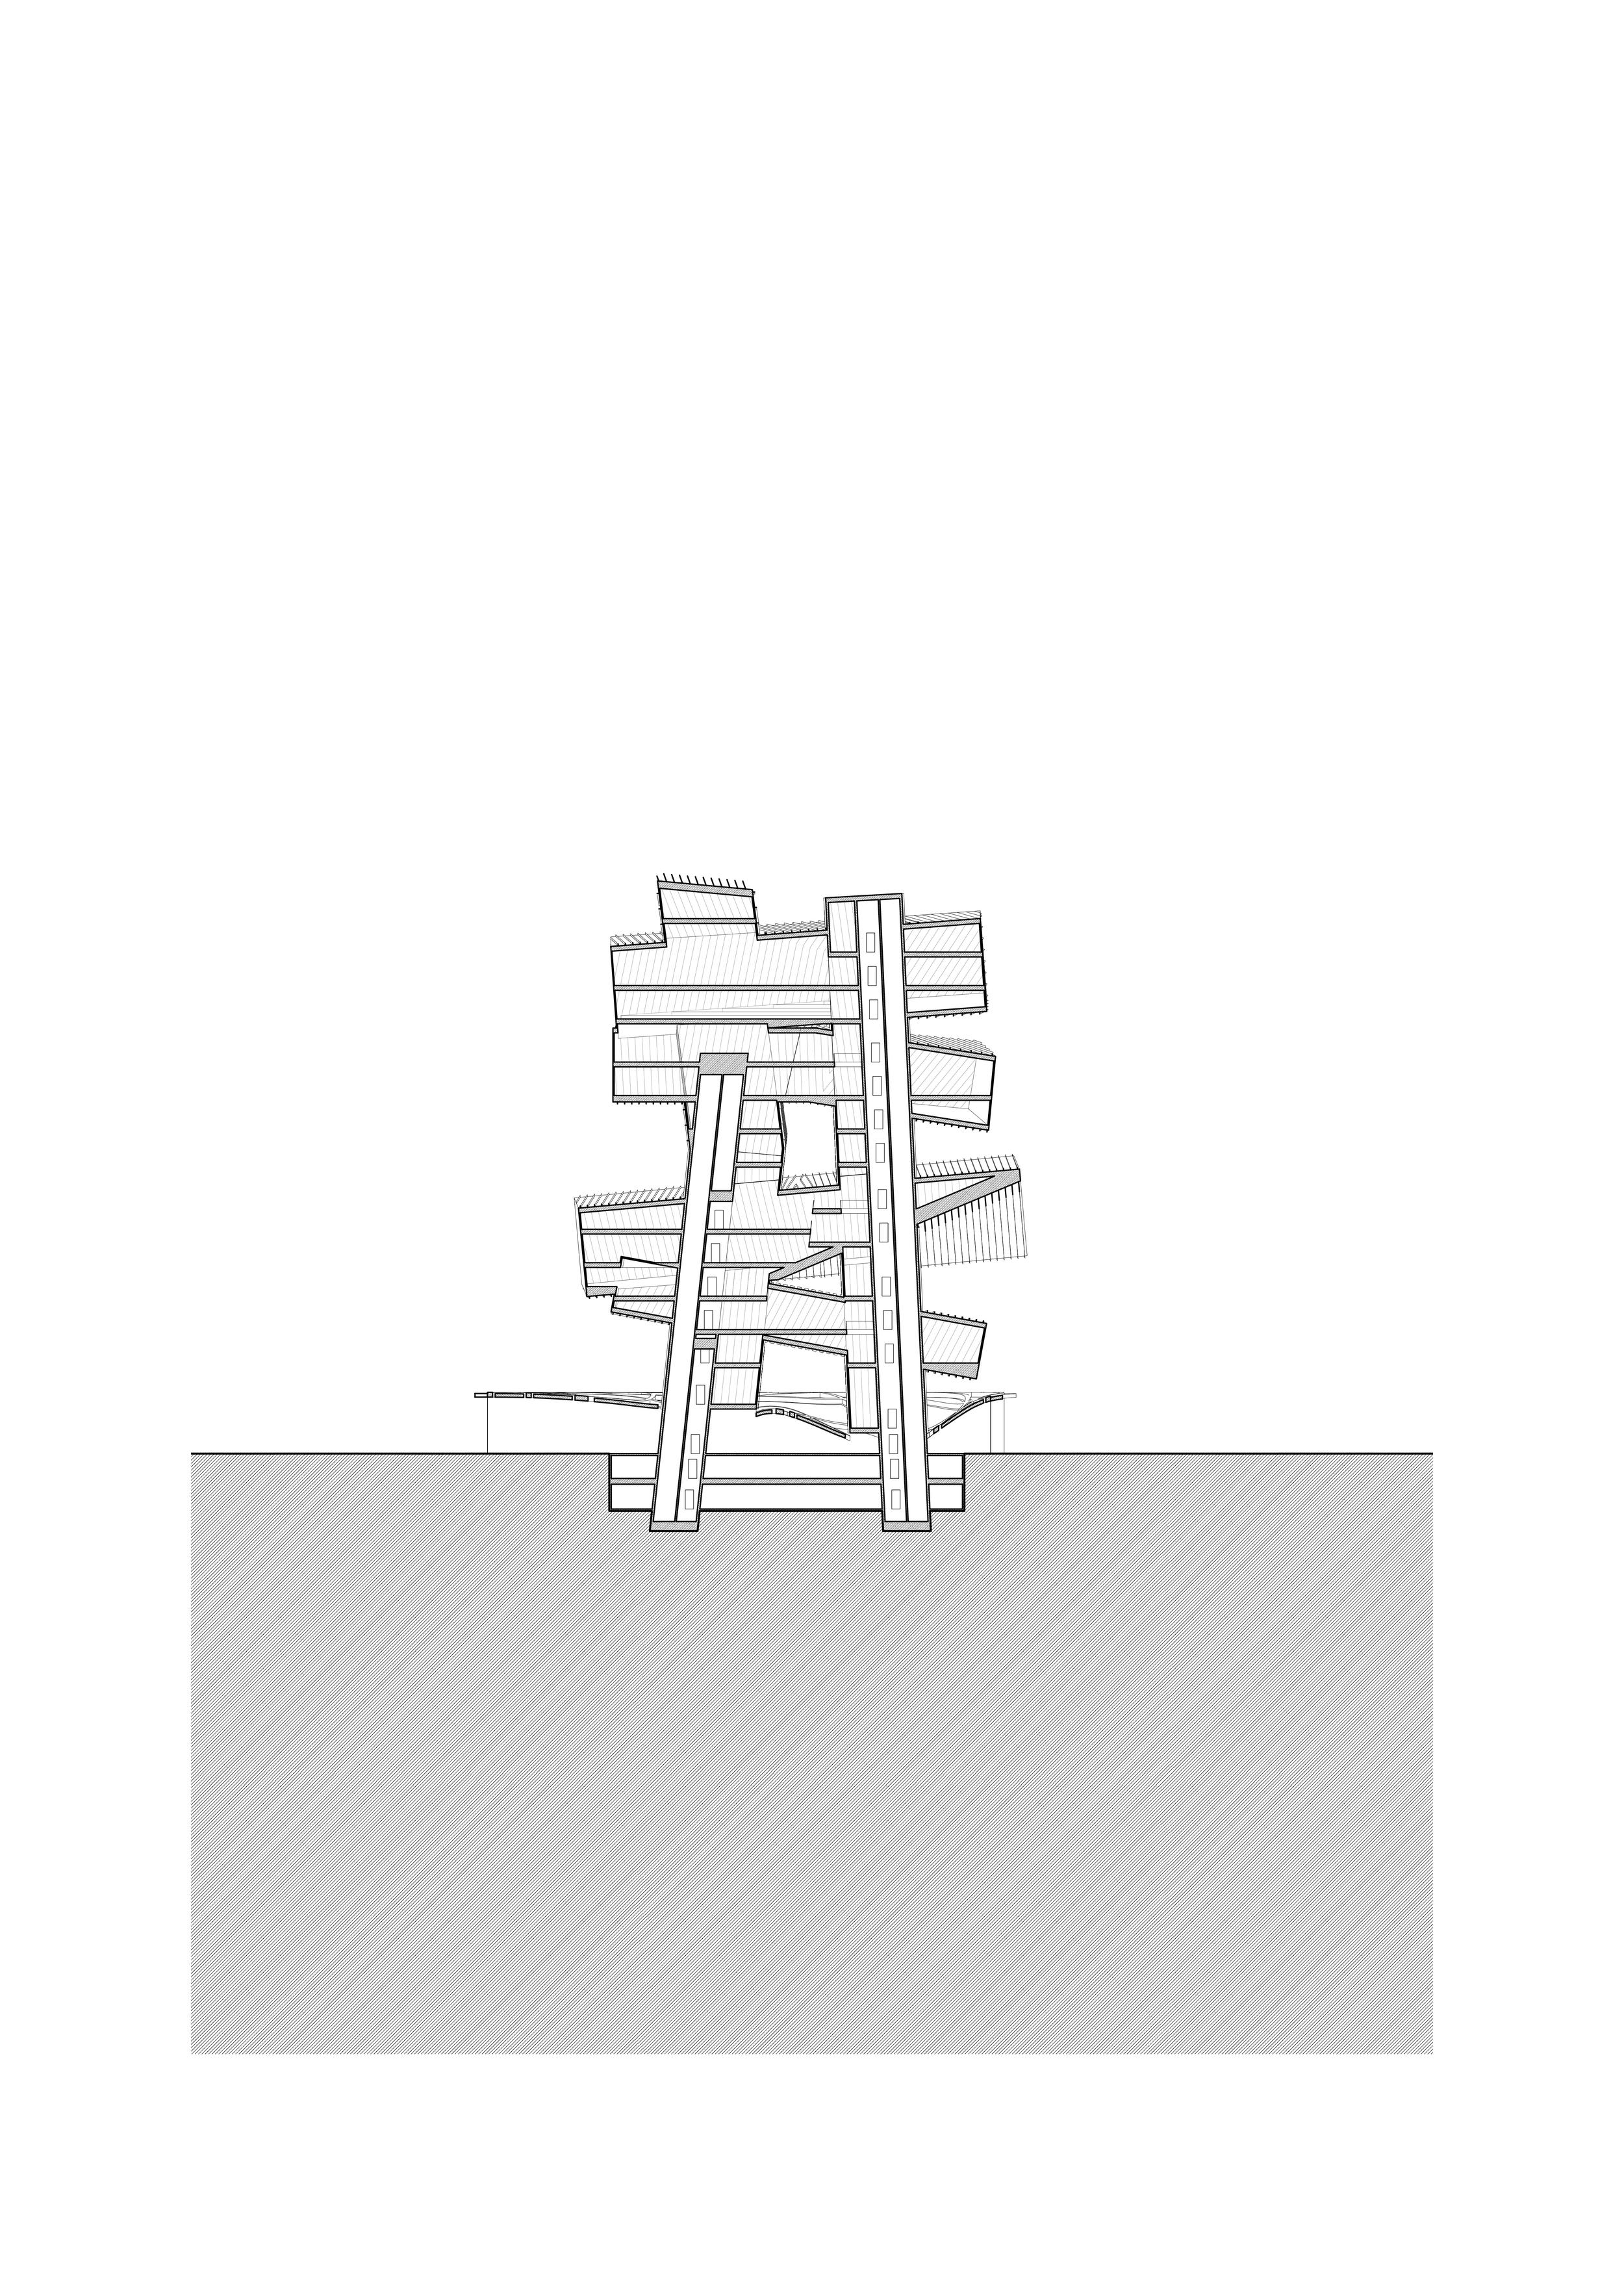 Grid_Squiggle_Artboard 1 copy 2.jpg